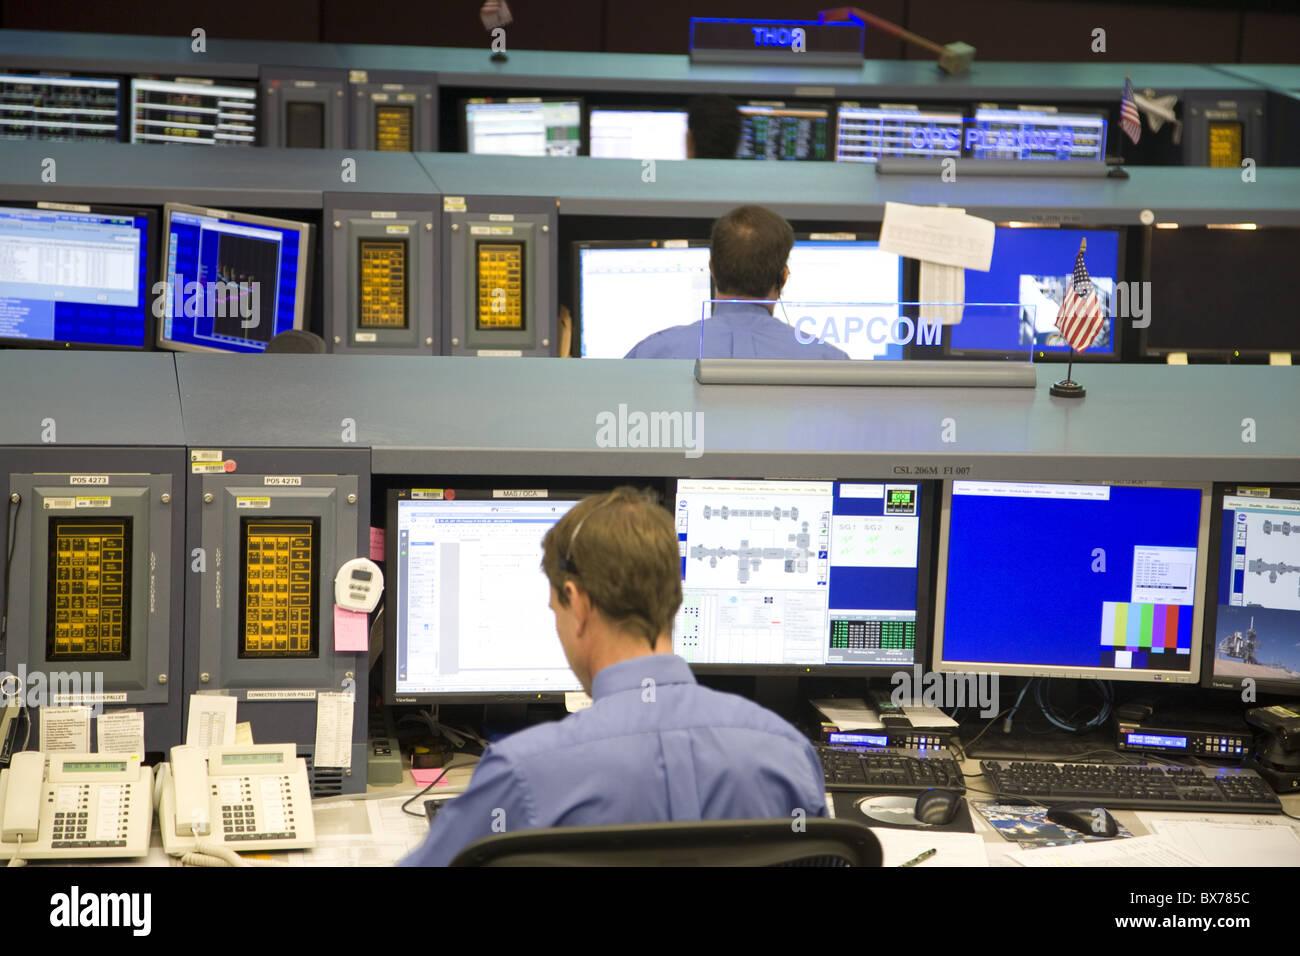 Mission Control room at NASA, Houston, Texas, United States of America, North America - Stock Image